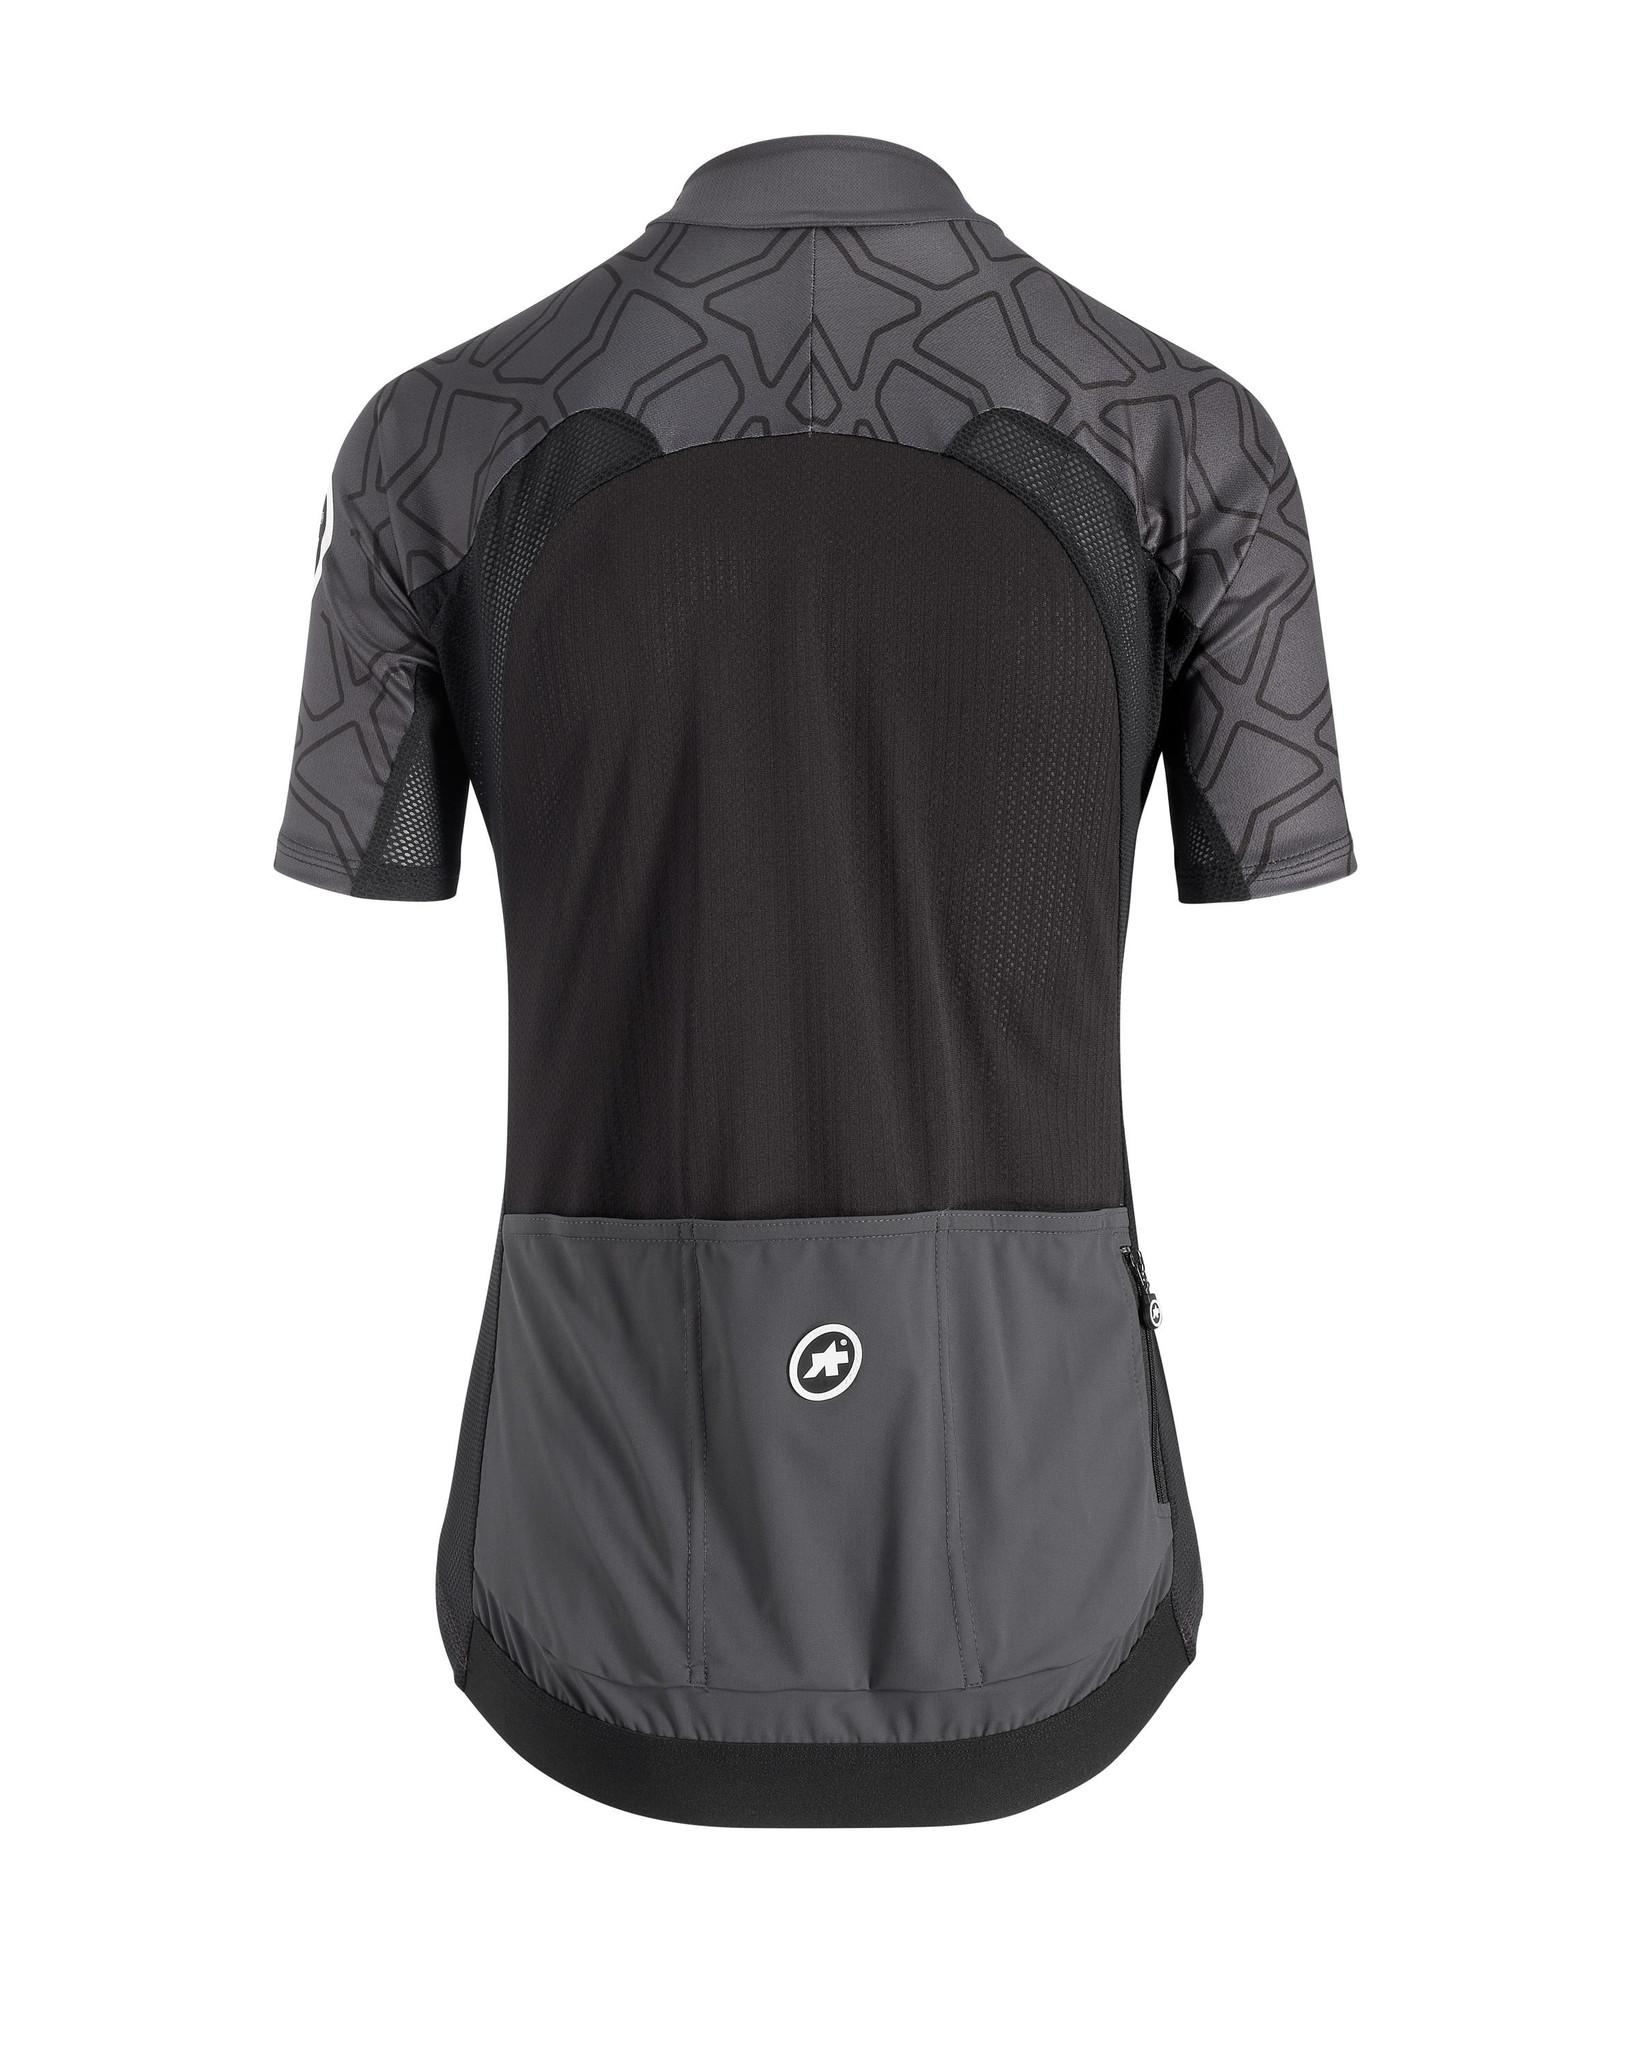 Assos Assos XC Shortsleeve jersey woman MTB Shirt Blauw